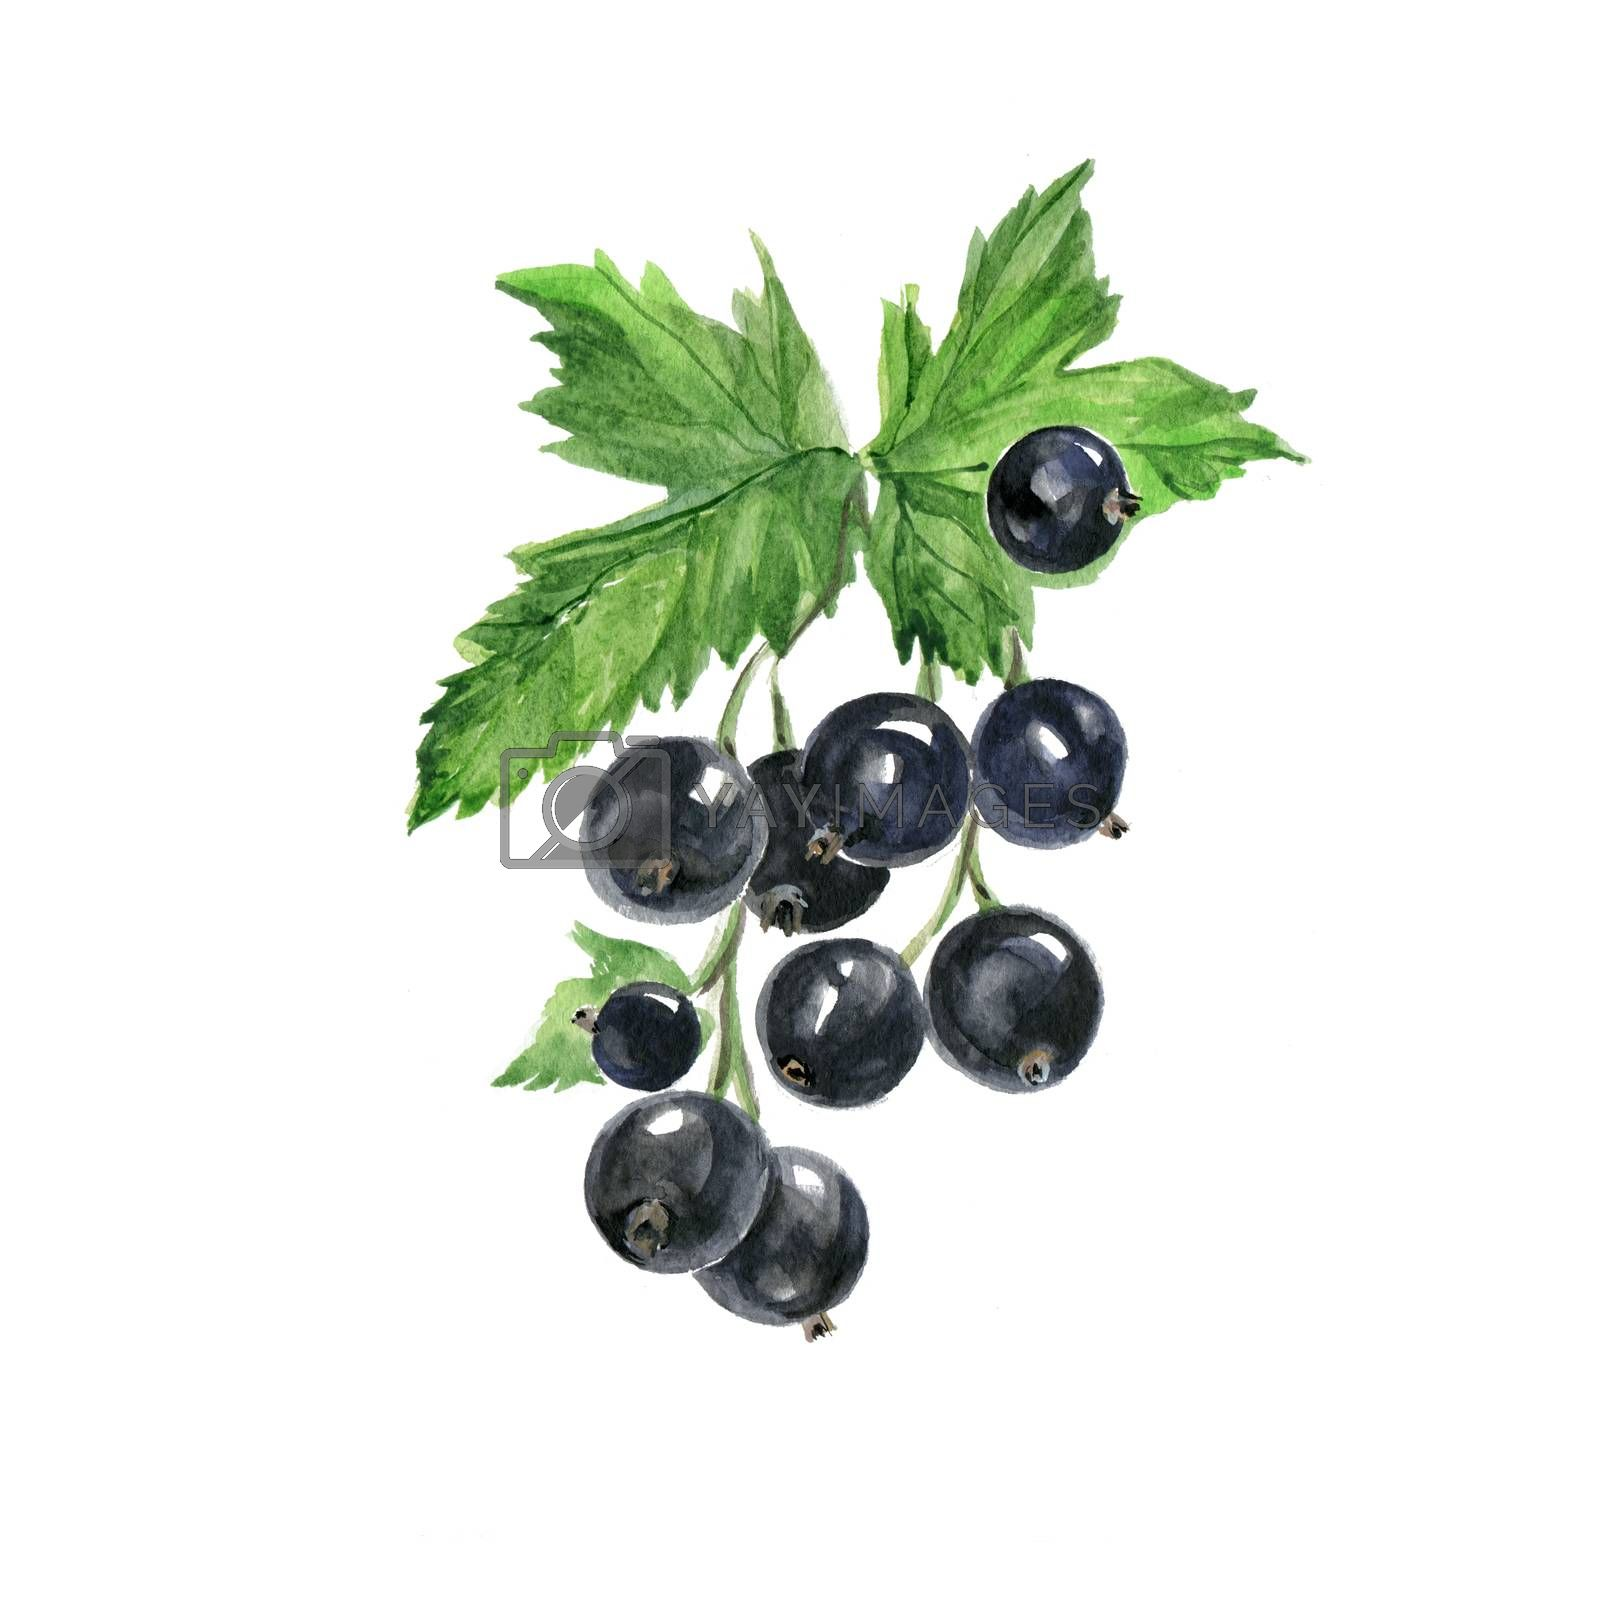 Watercolor Black Curran. Hand Drawn Illustration Organic Food Vegetarian Ingredient